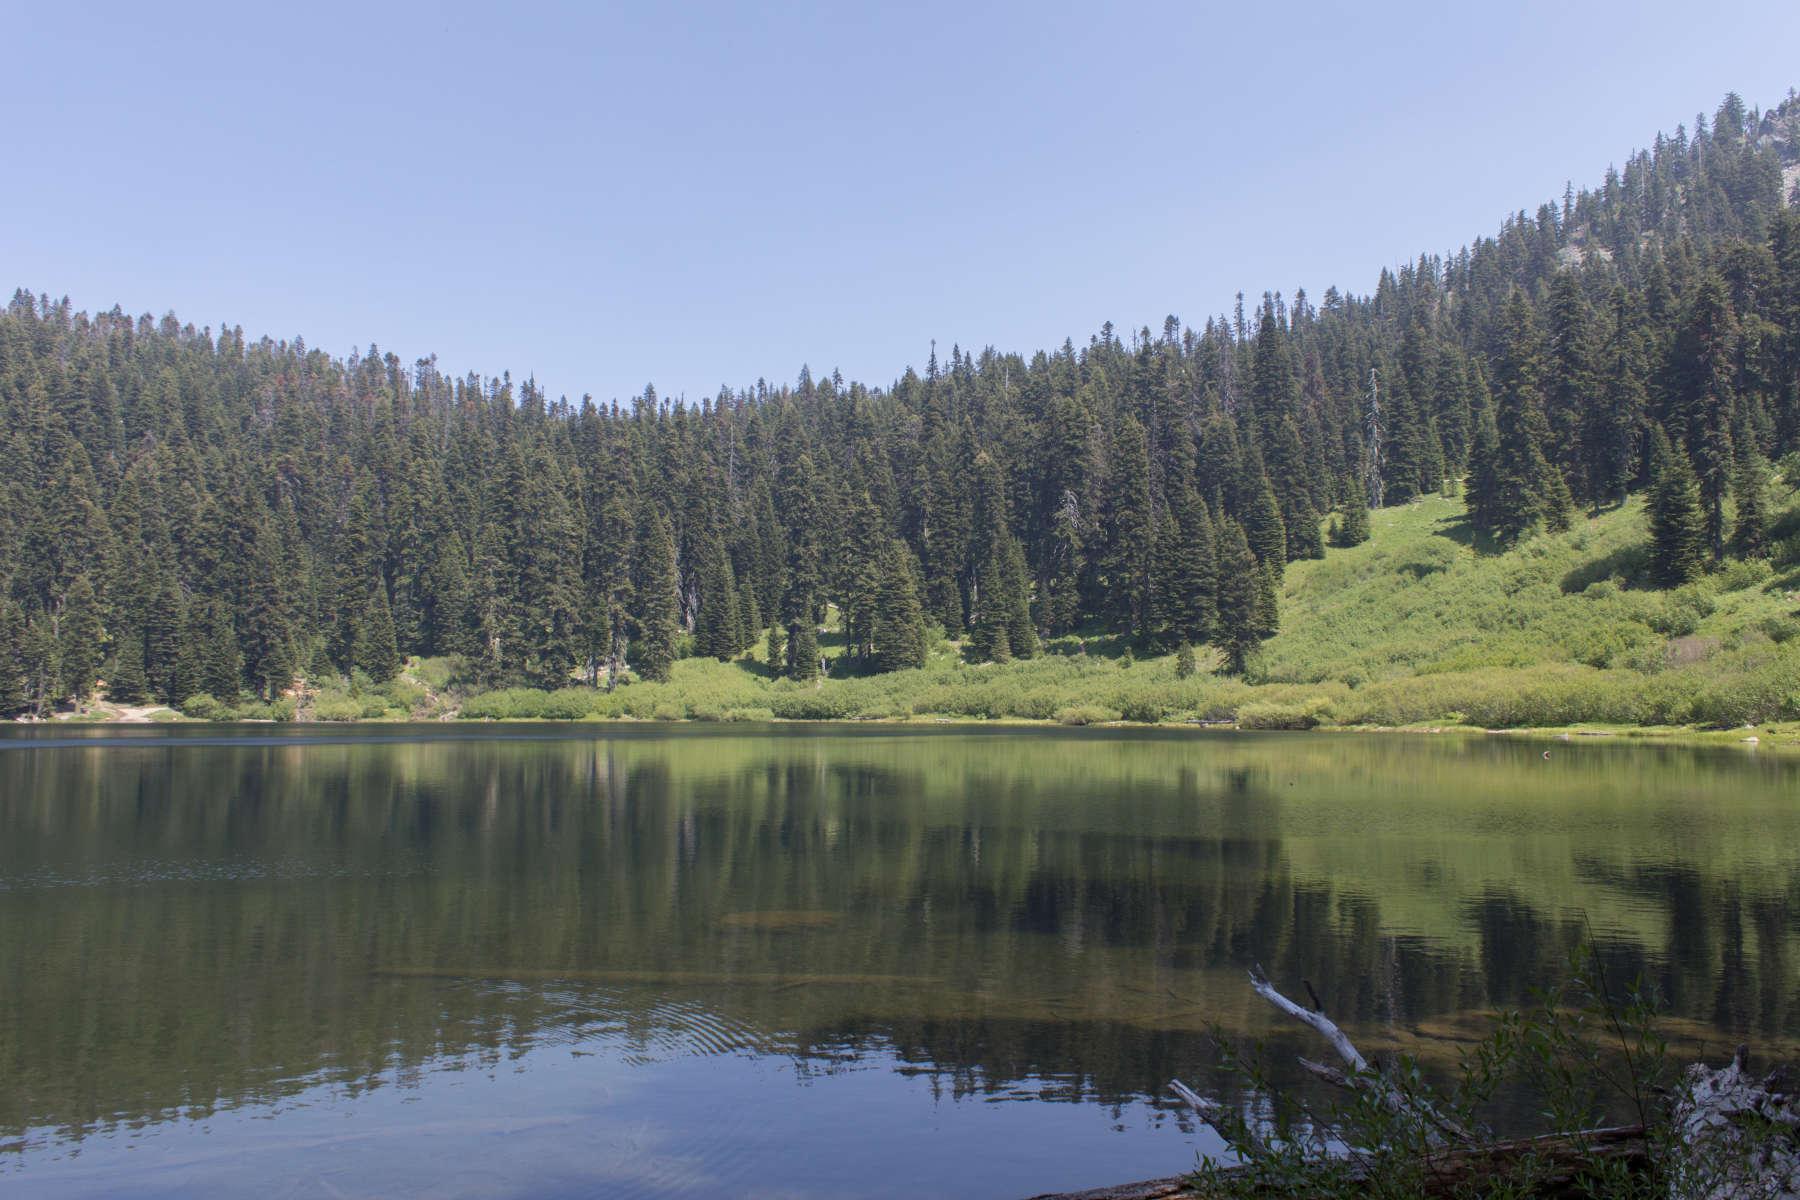 Bolan lake campground rogue river siskiyou or 1 for Lake siskiyou resort cabins